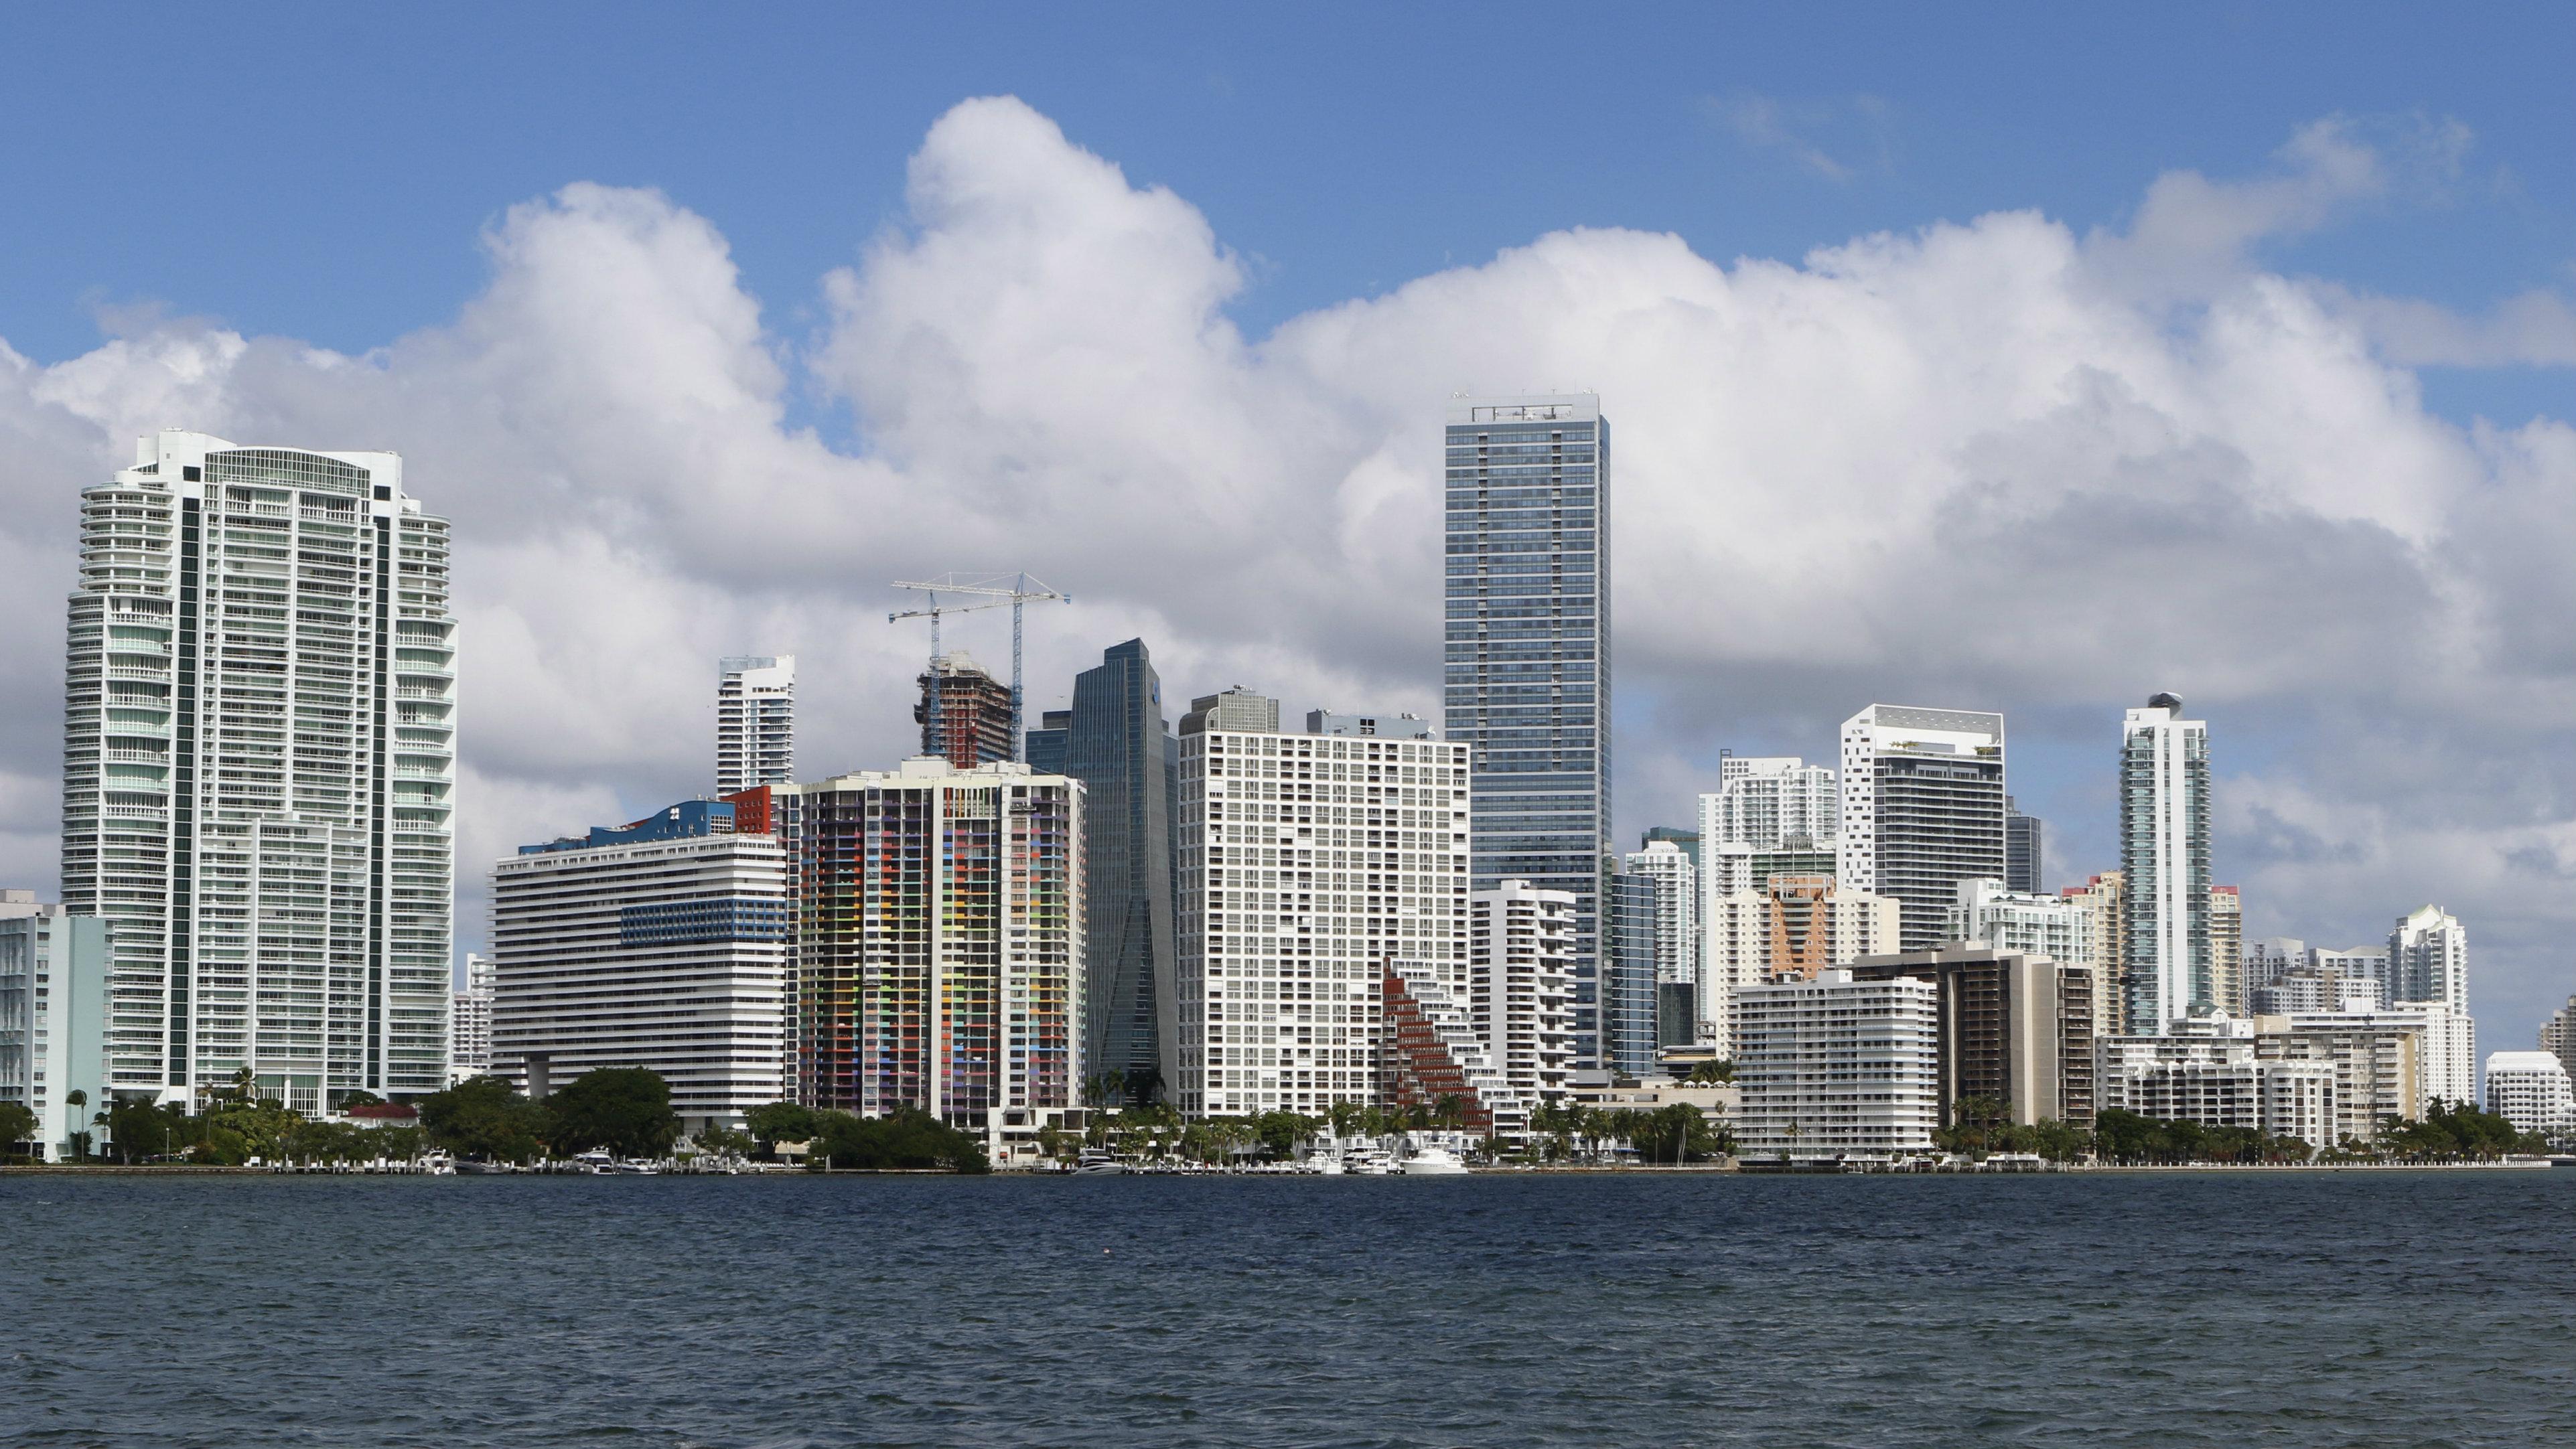 Miami's downtown, full of glittering skyscrapers.